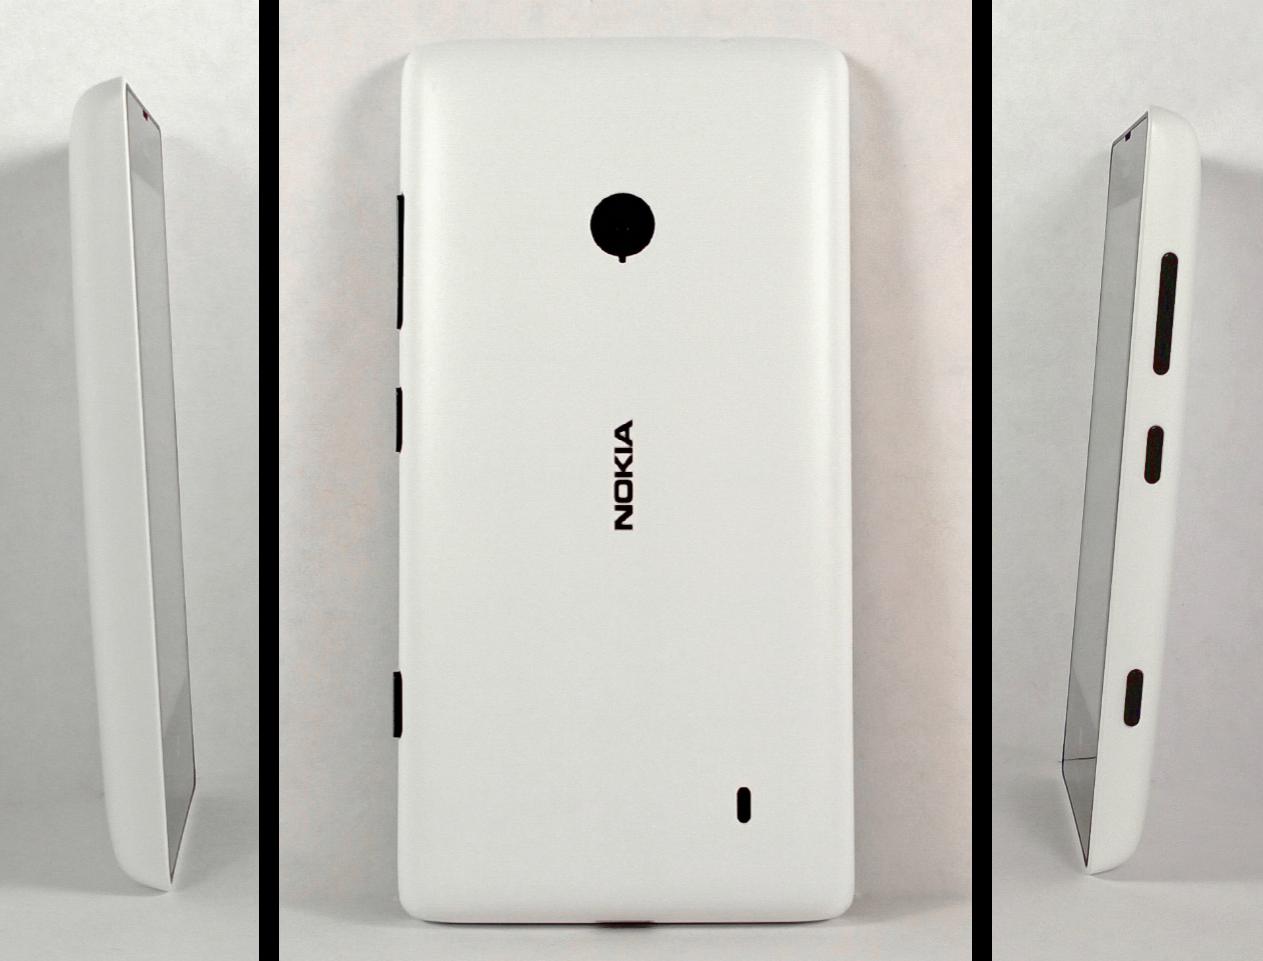 Lumia 521 update to windows 10 - Lumia 521 Back Collage